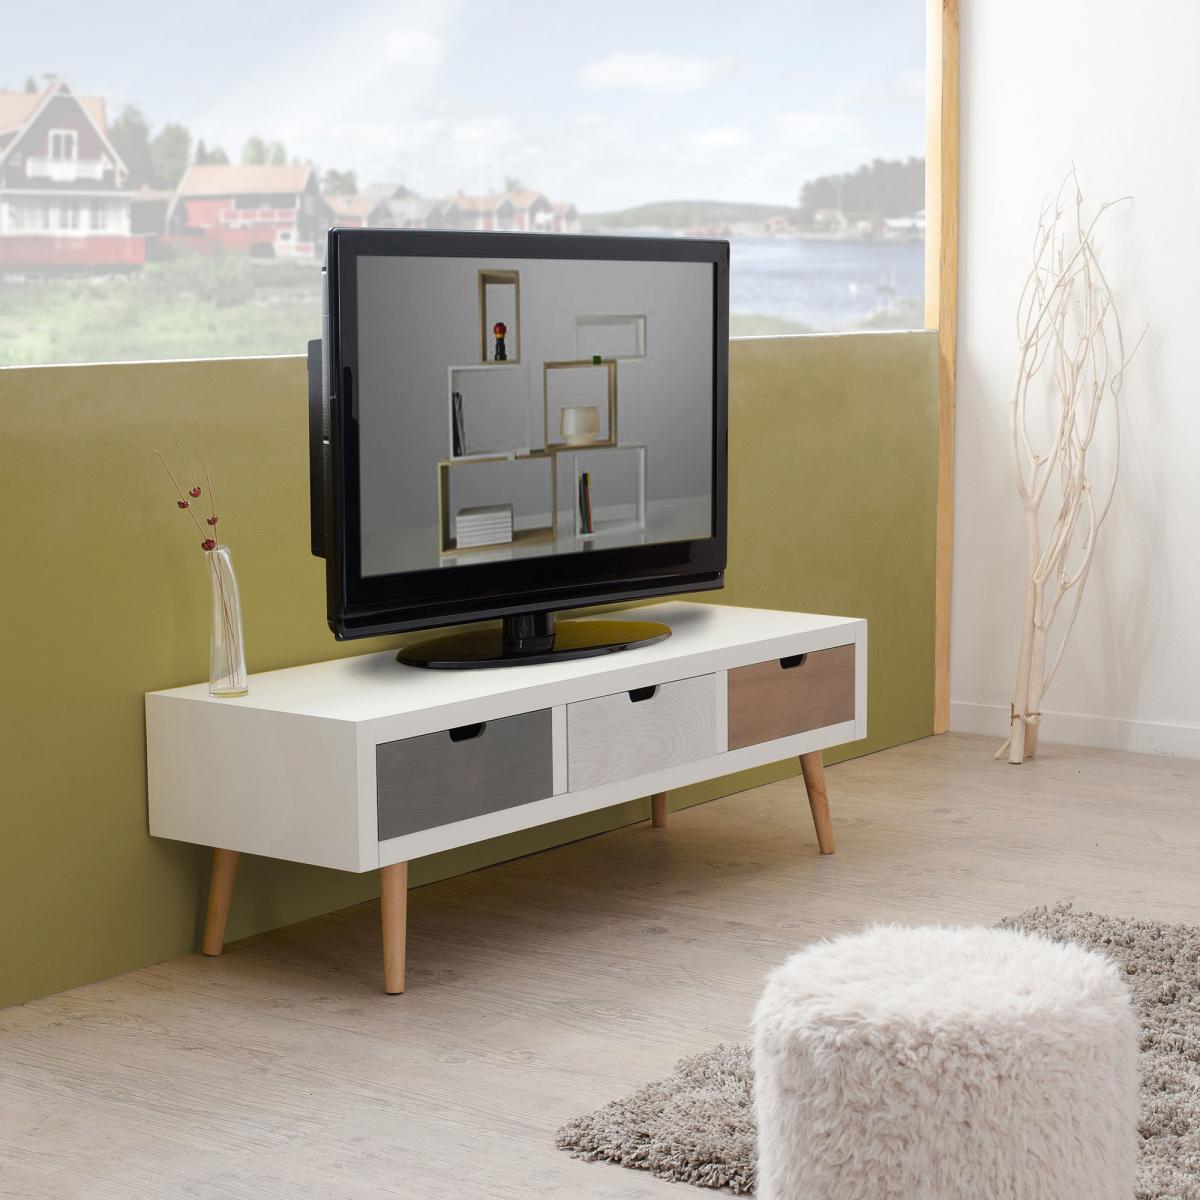 MACABANE Meuble rectangulaire TV 3 tiroirs - Multicolore